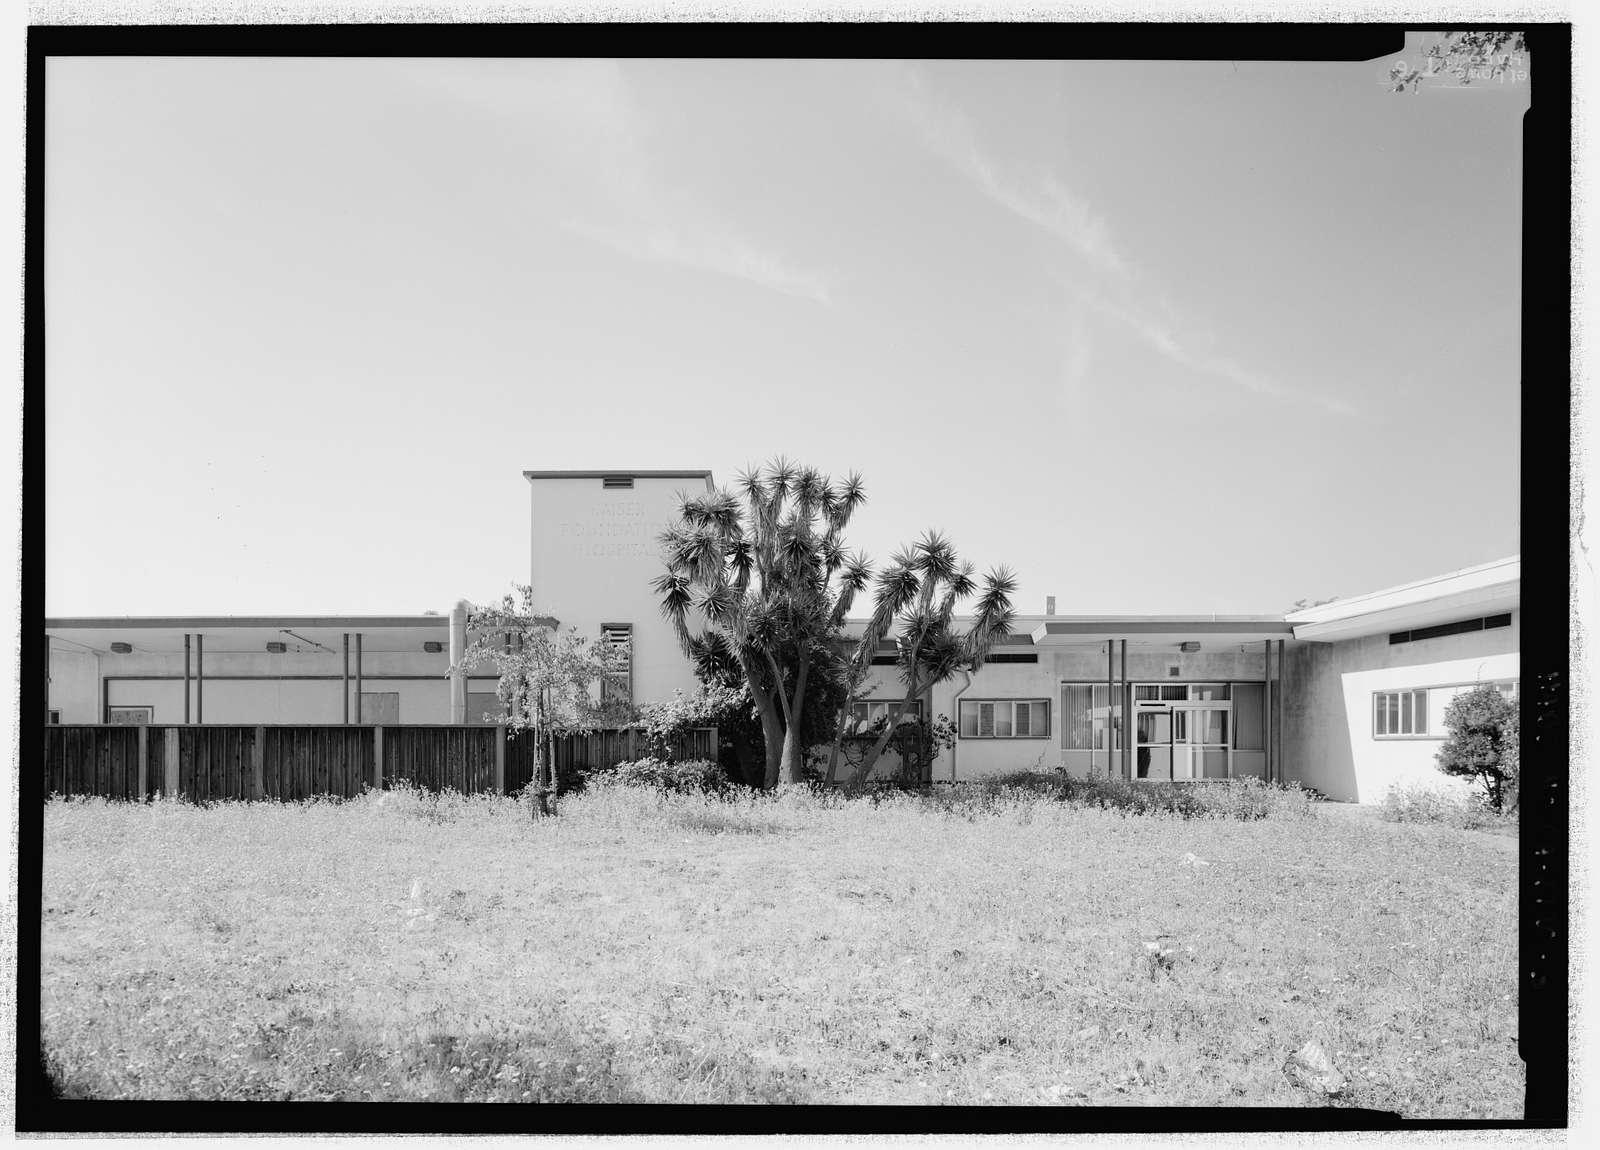 Richmond Field Hospital, 1330 Cutting Boulevard, Richmond, Contra Costa County, CA